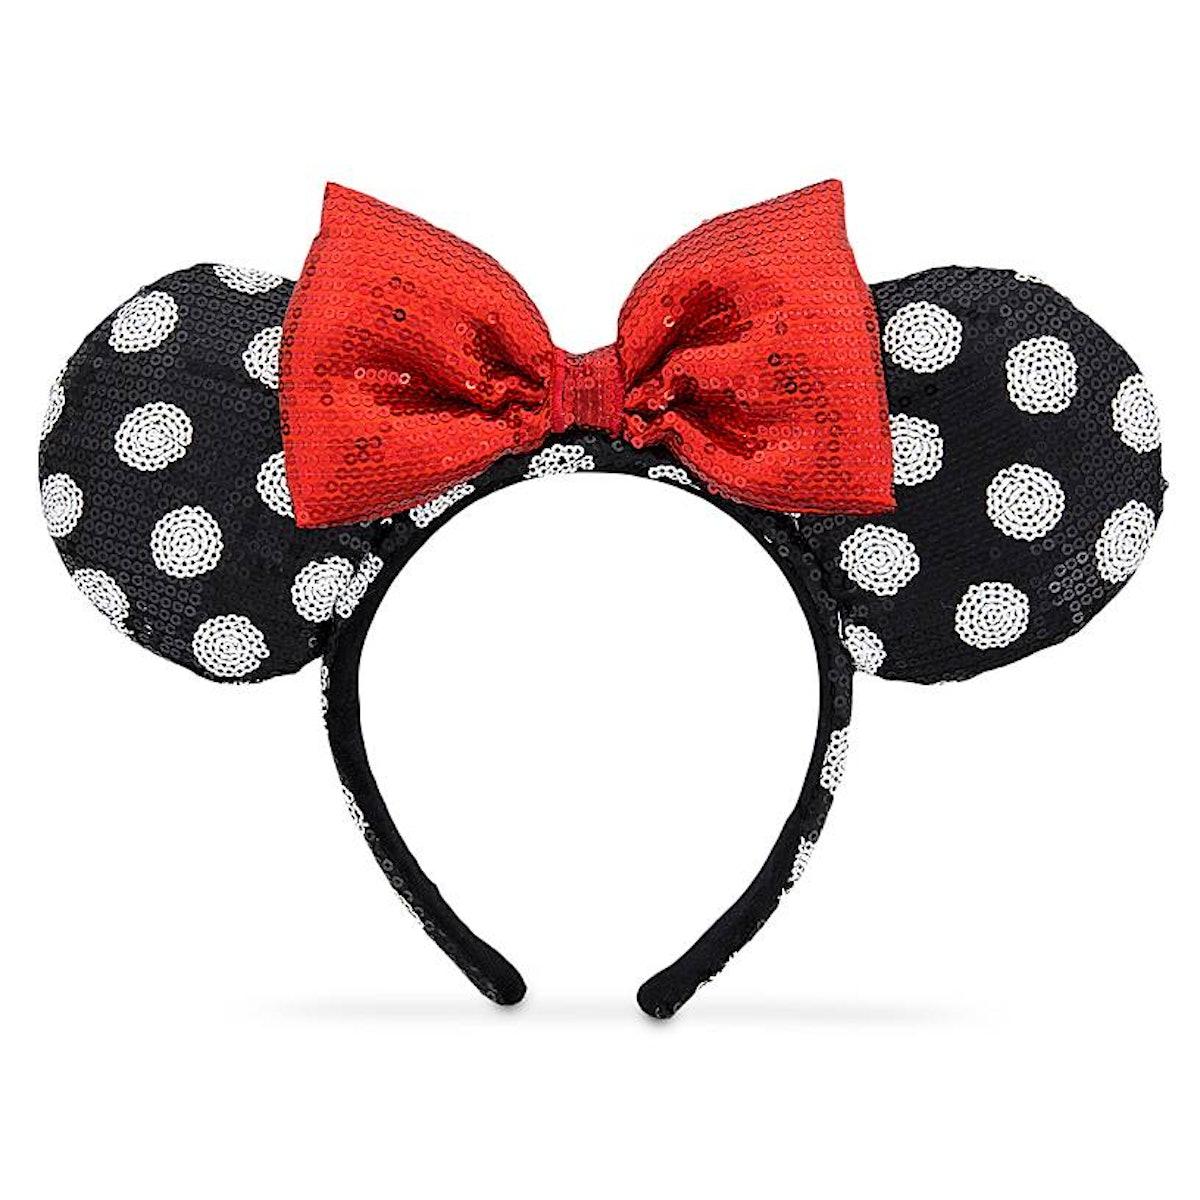 Minnie Mouse Ear Headband — Black and White